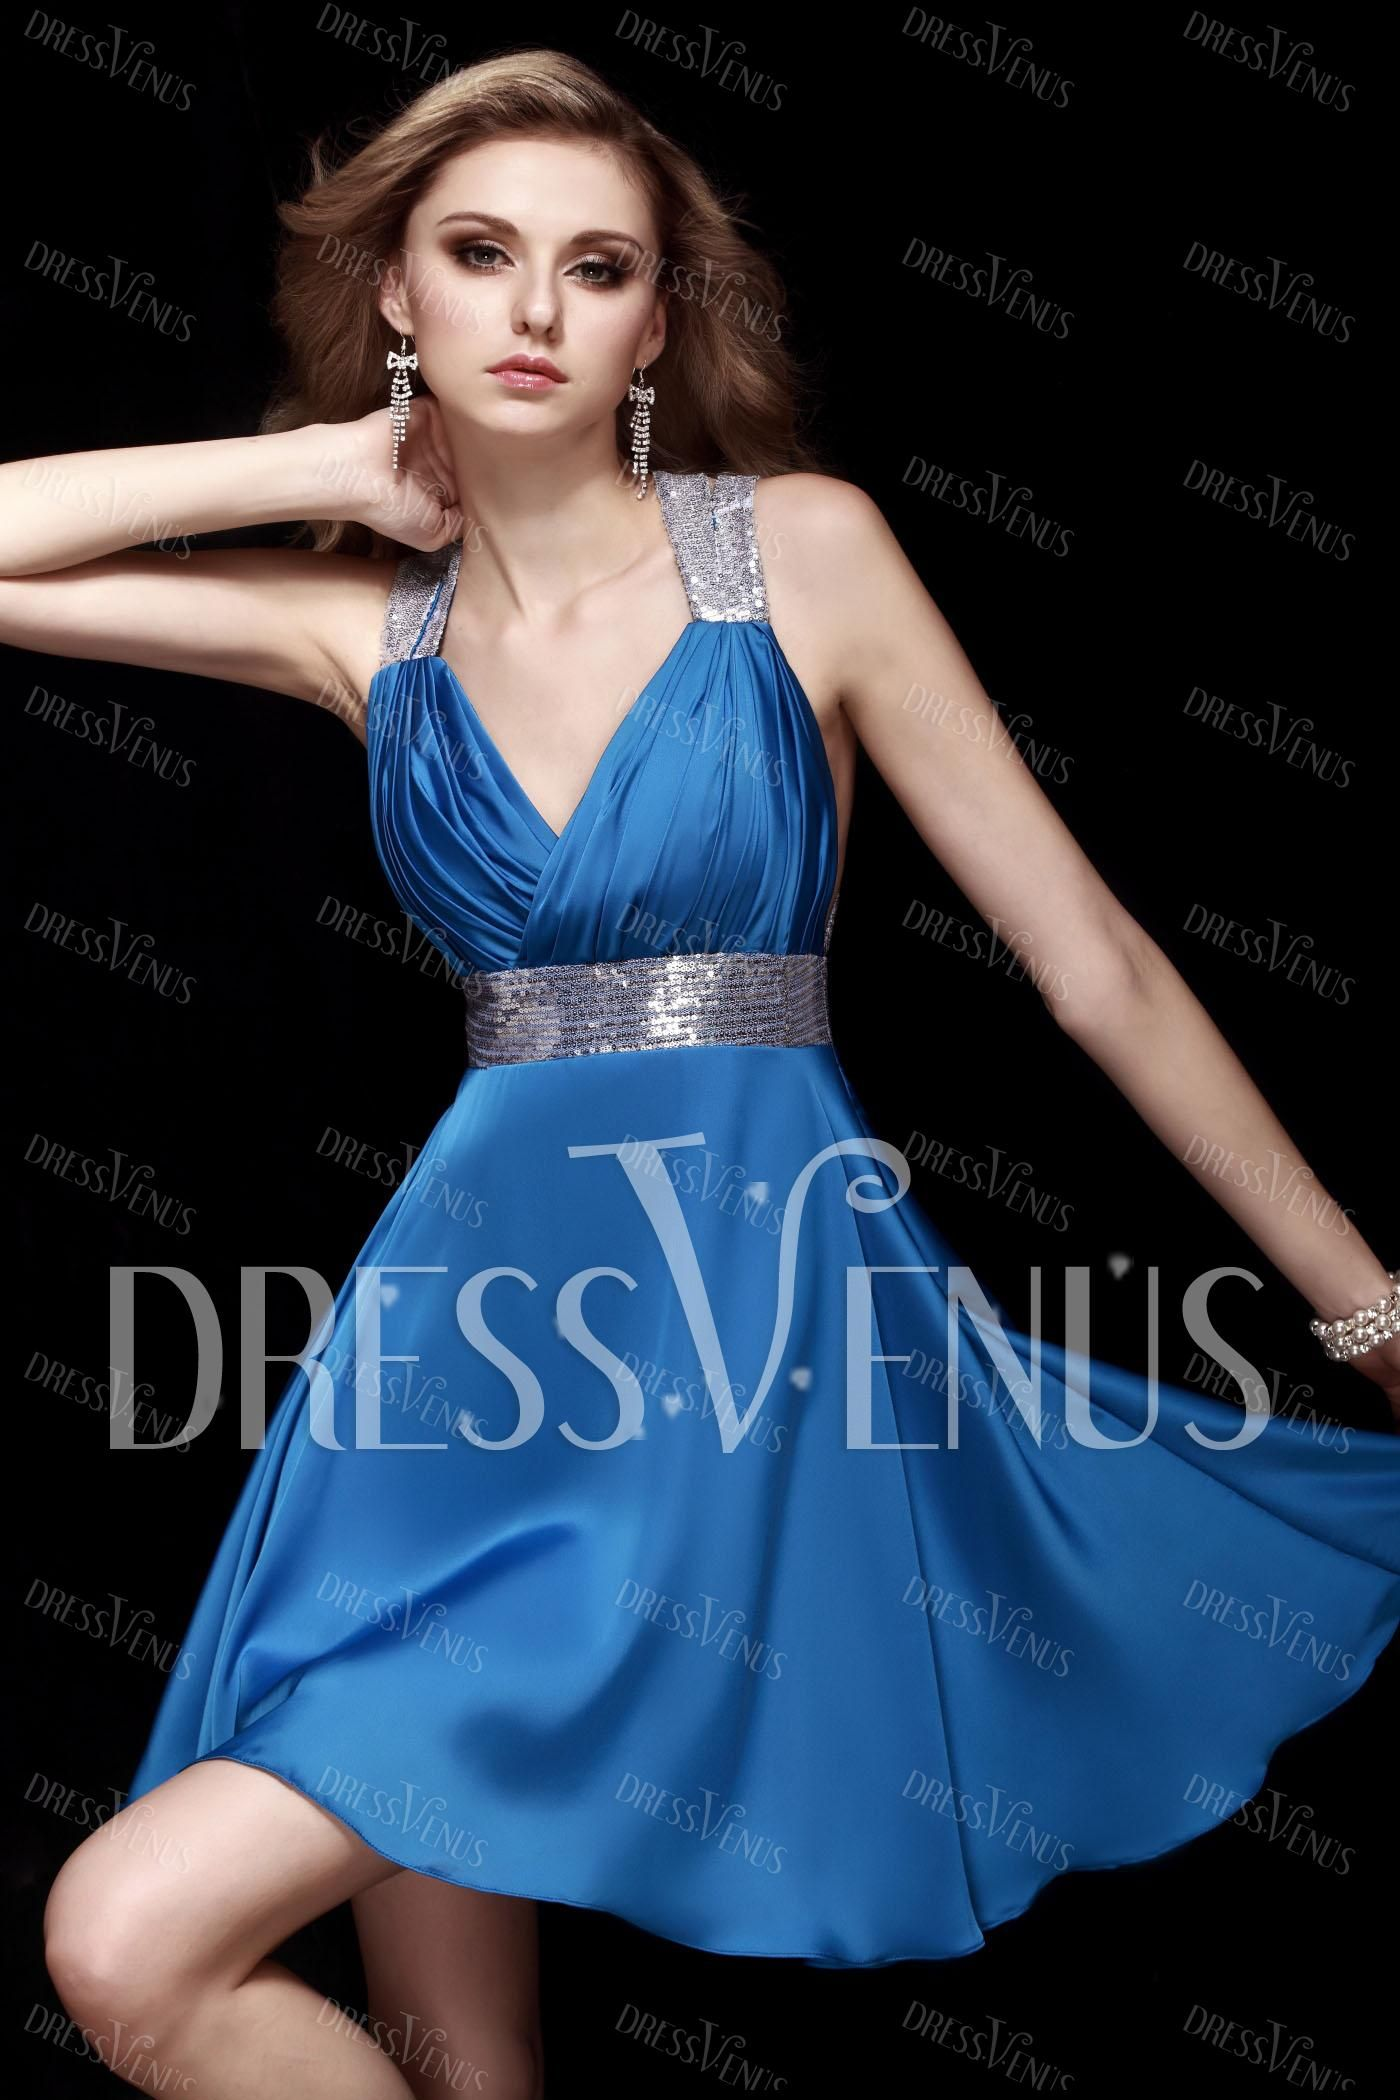 Cute aline short dress day dresses pinterest venus swimwear